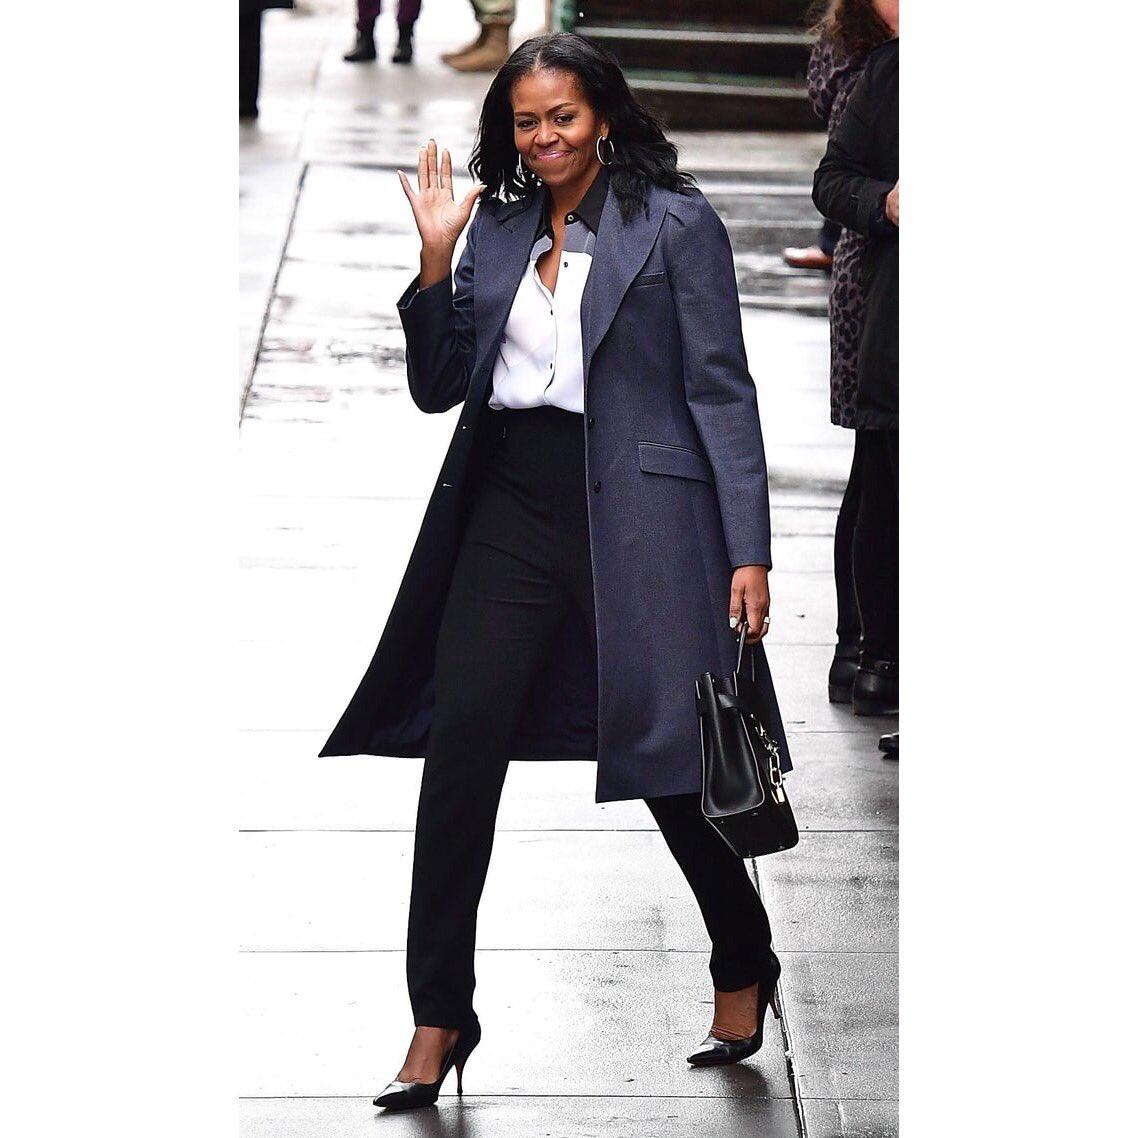 Michelle Obama for President :-) #obama #michelleobama2020 #politics #cnn #bfmtv #cnews #usa #PresidentialElection<br>http://pic.twitter.com/mrYMc7qNpN